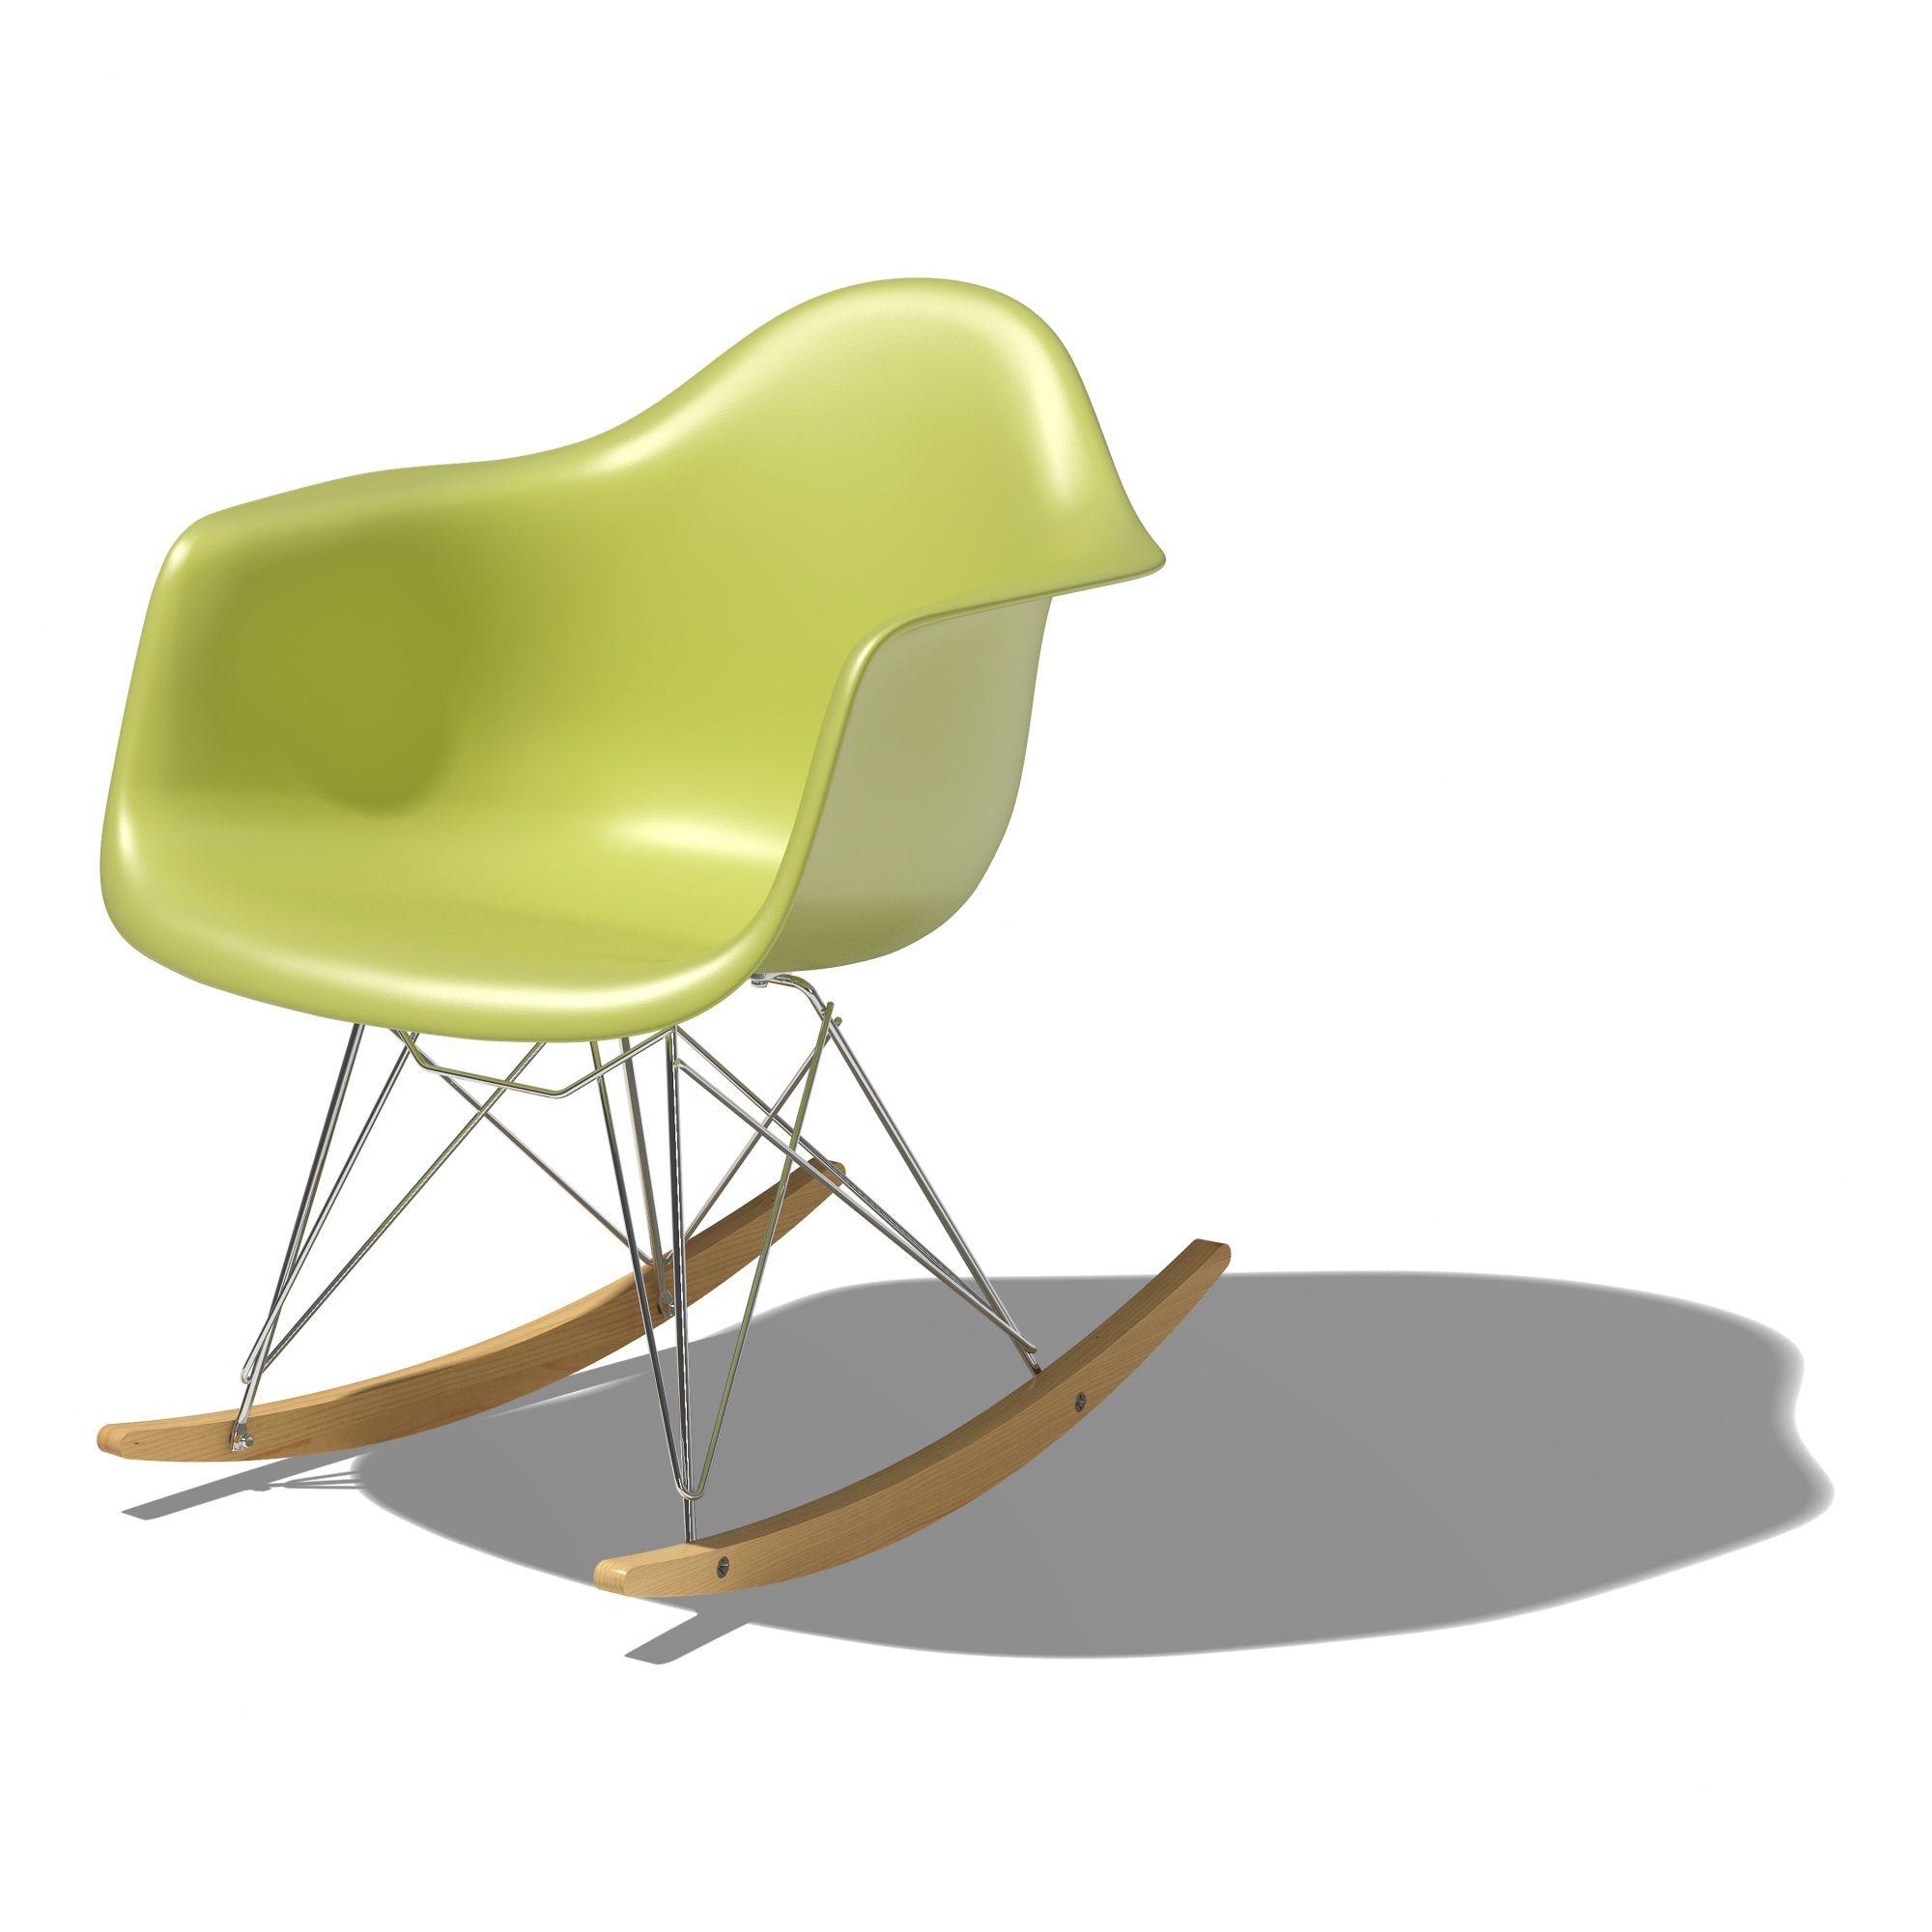 Herman Miller Eames Rar Molded Plastic Armchair With Rocker  # Muebles Dutailier